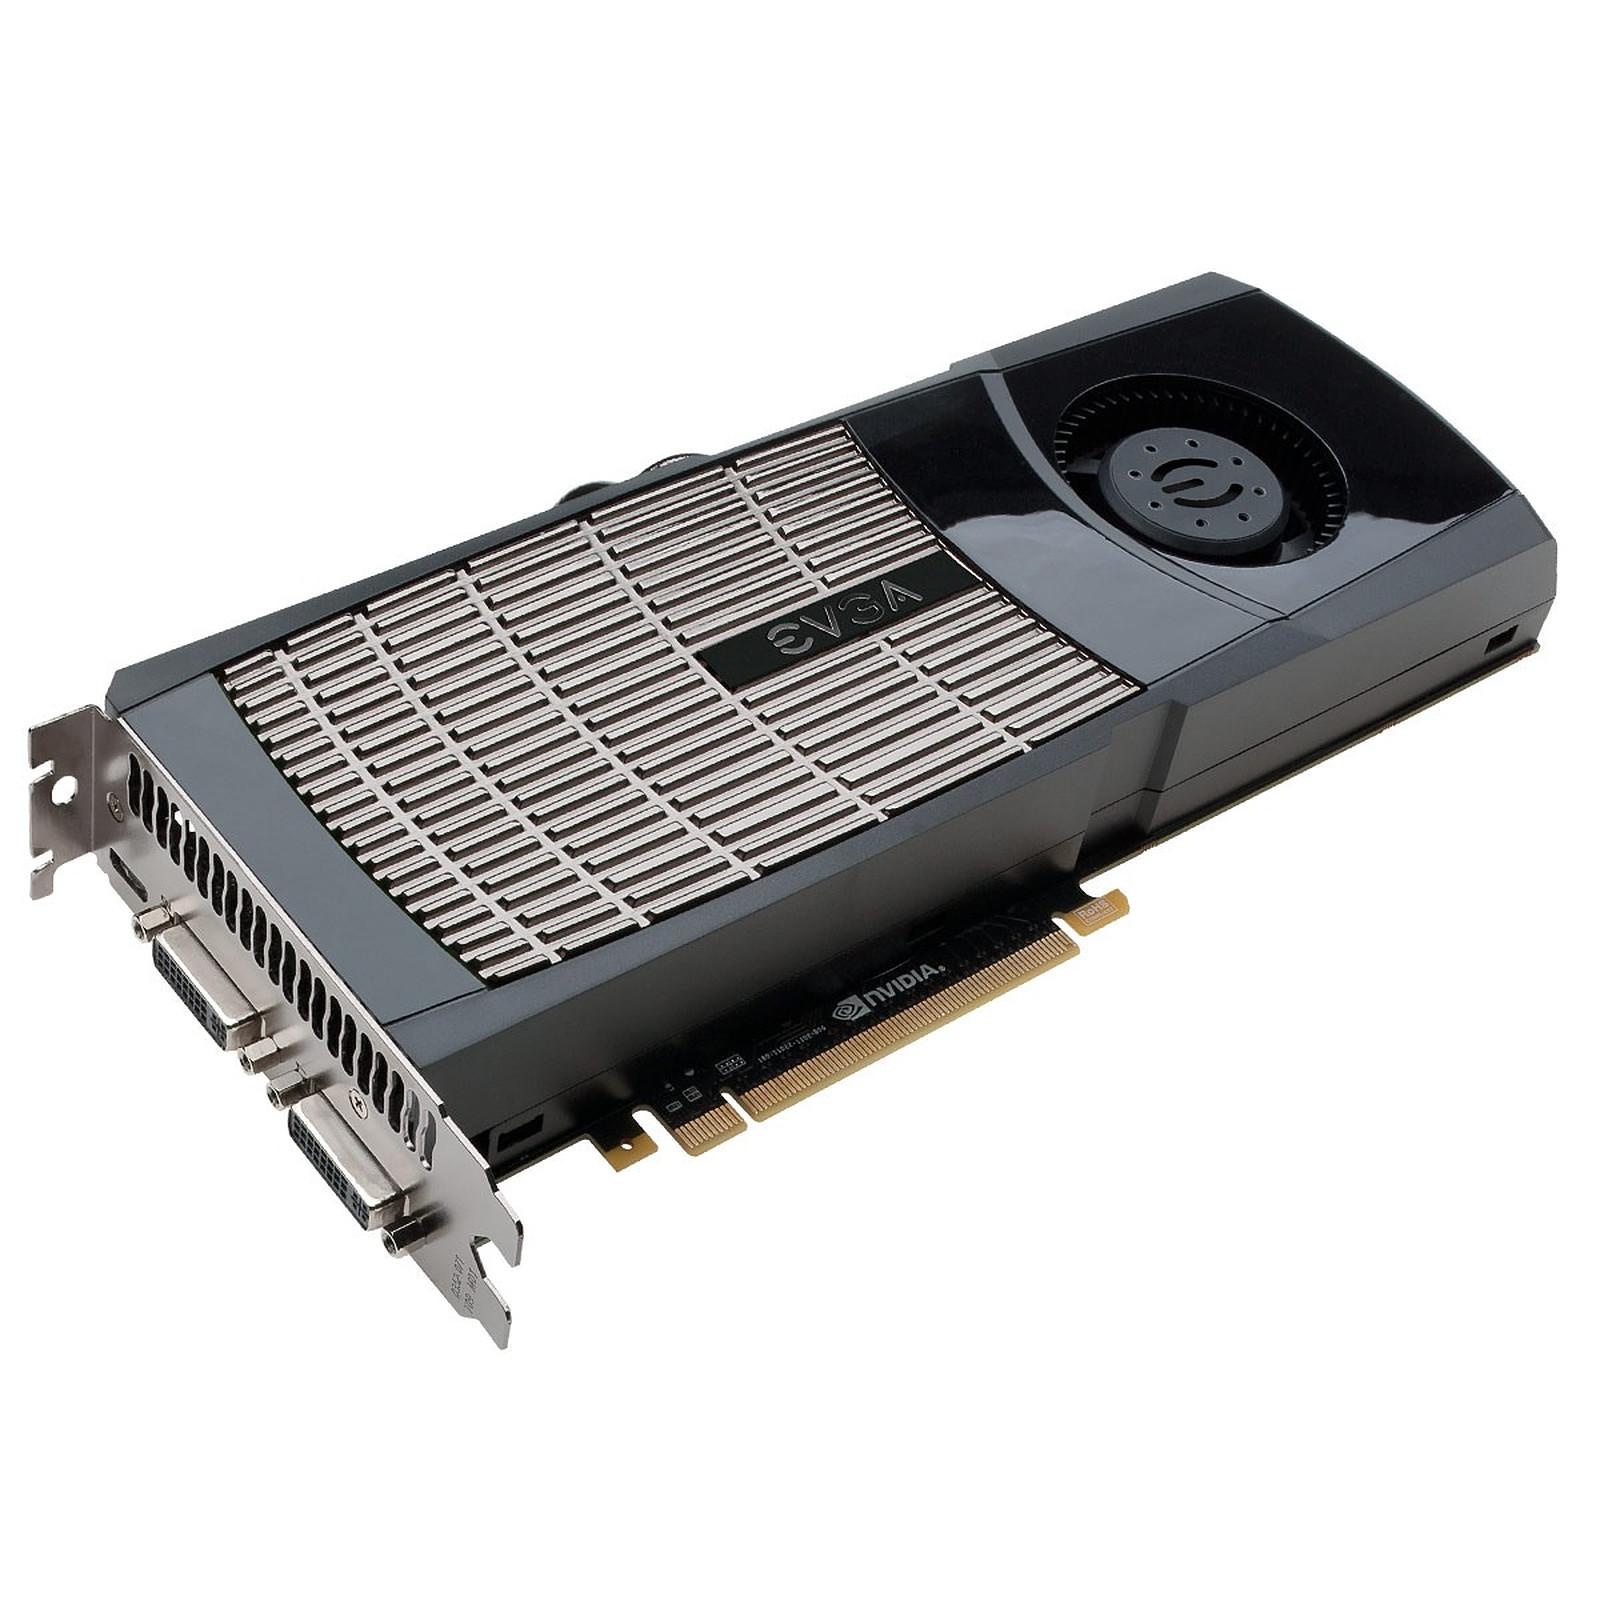 EVGA GeForce GTX 480 1536 MB